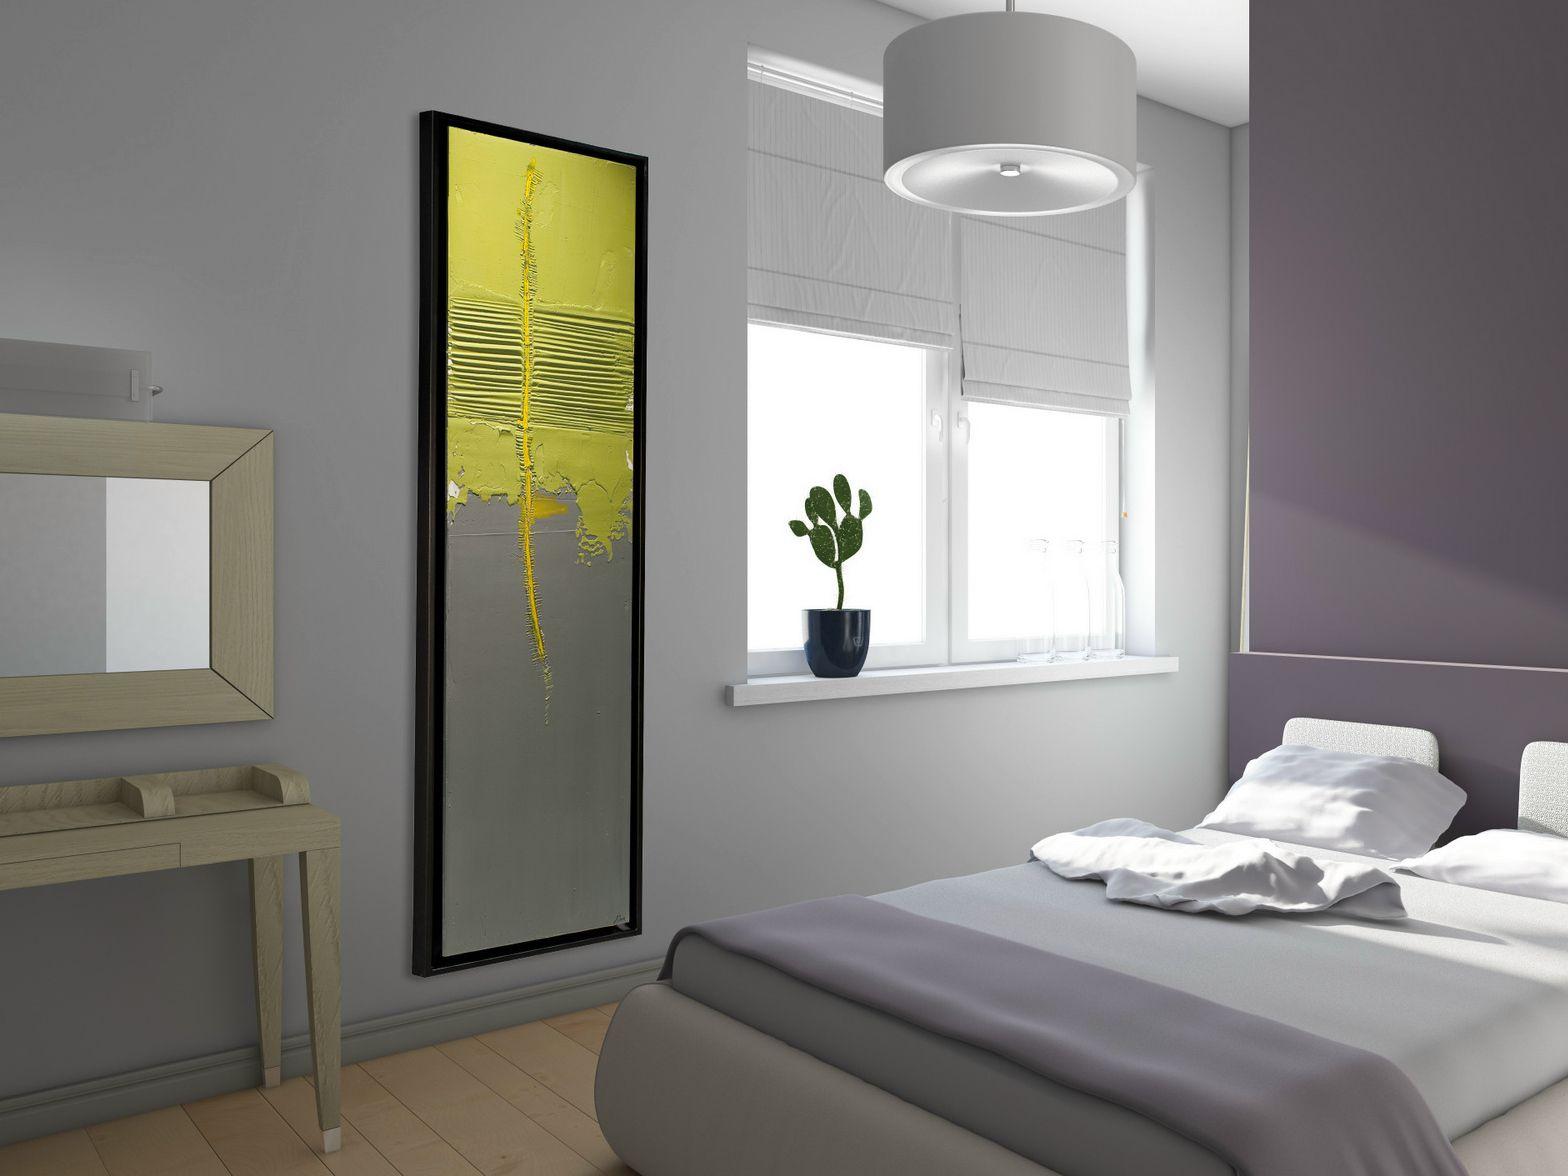 Radiateur ventil chaud froid en olycale greenor for Radiateur contemporain